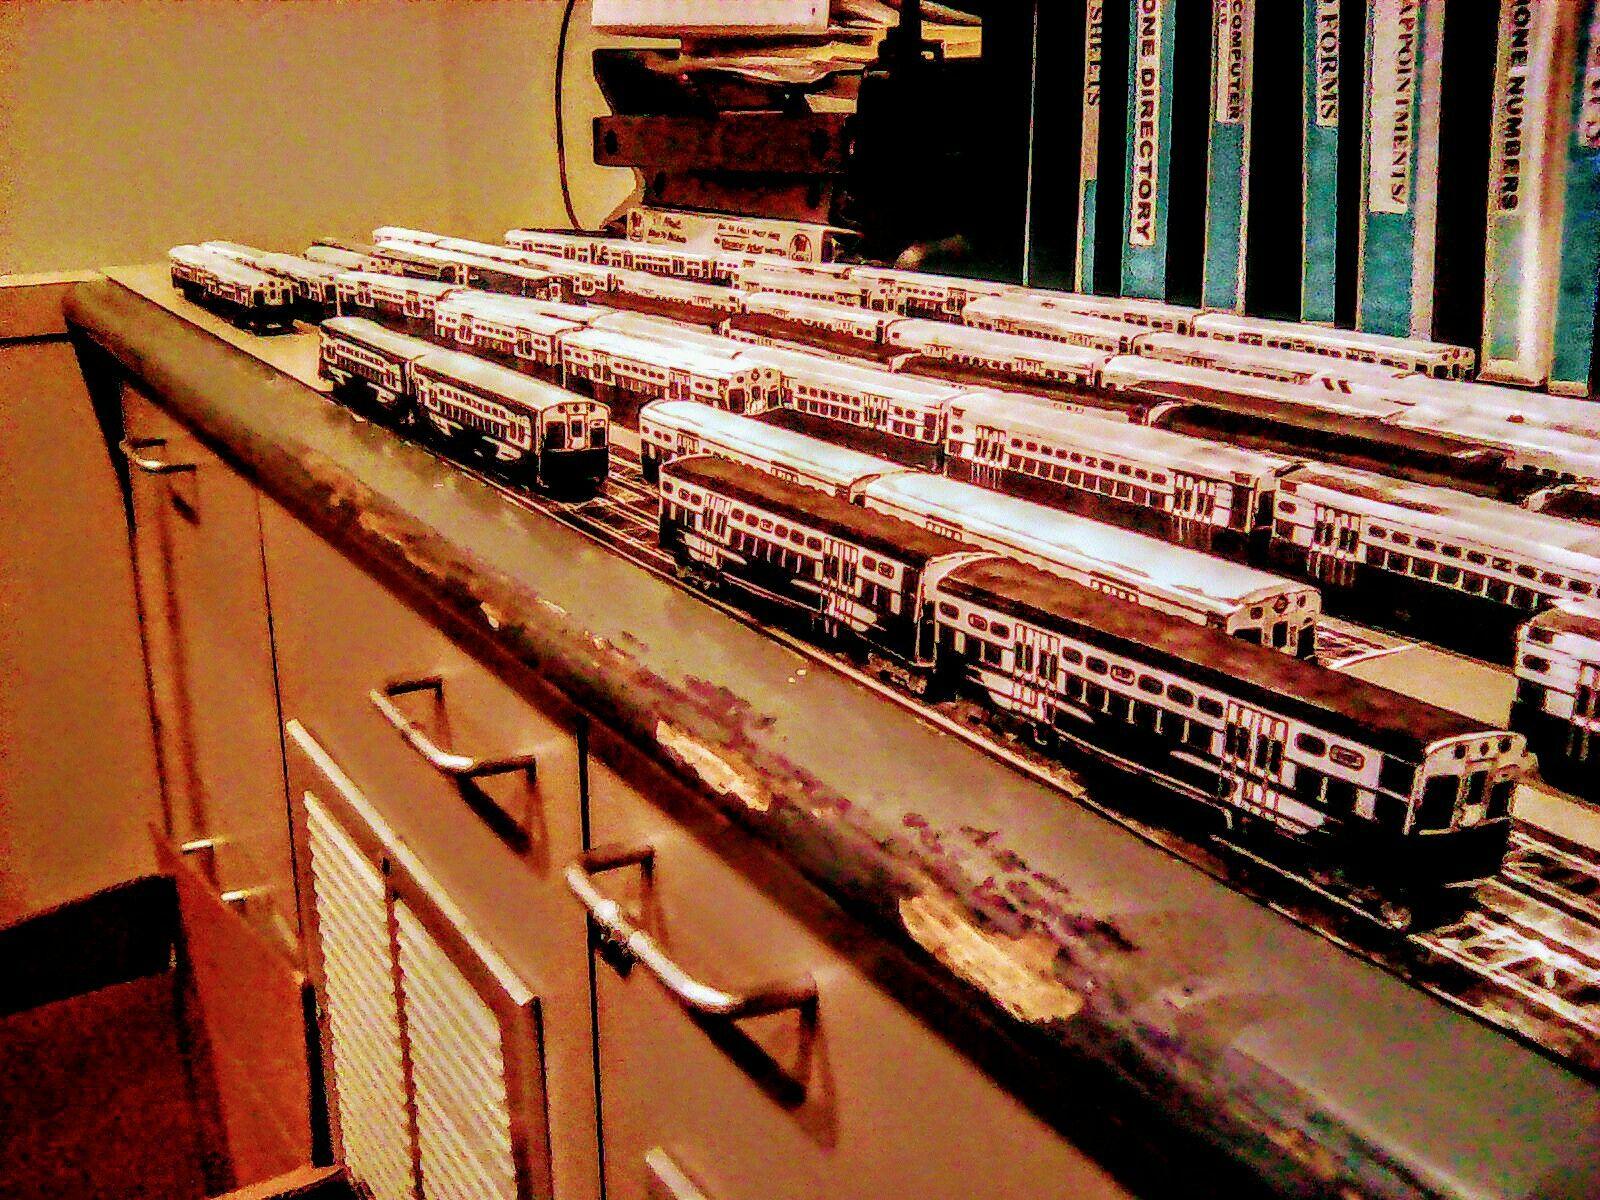 Cta 6000 Series Model Trains Model Trains Model Railroad Ho Model Trains